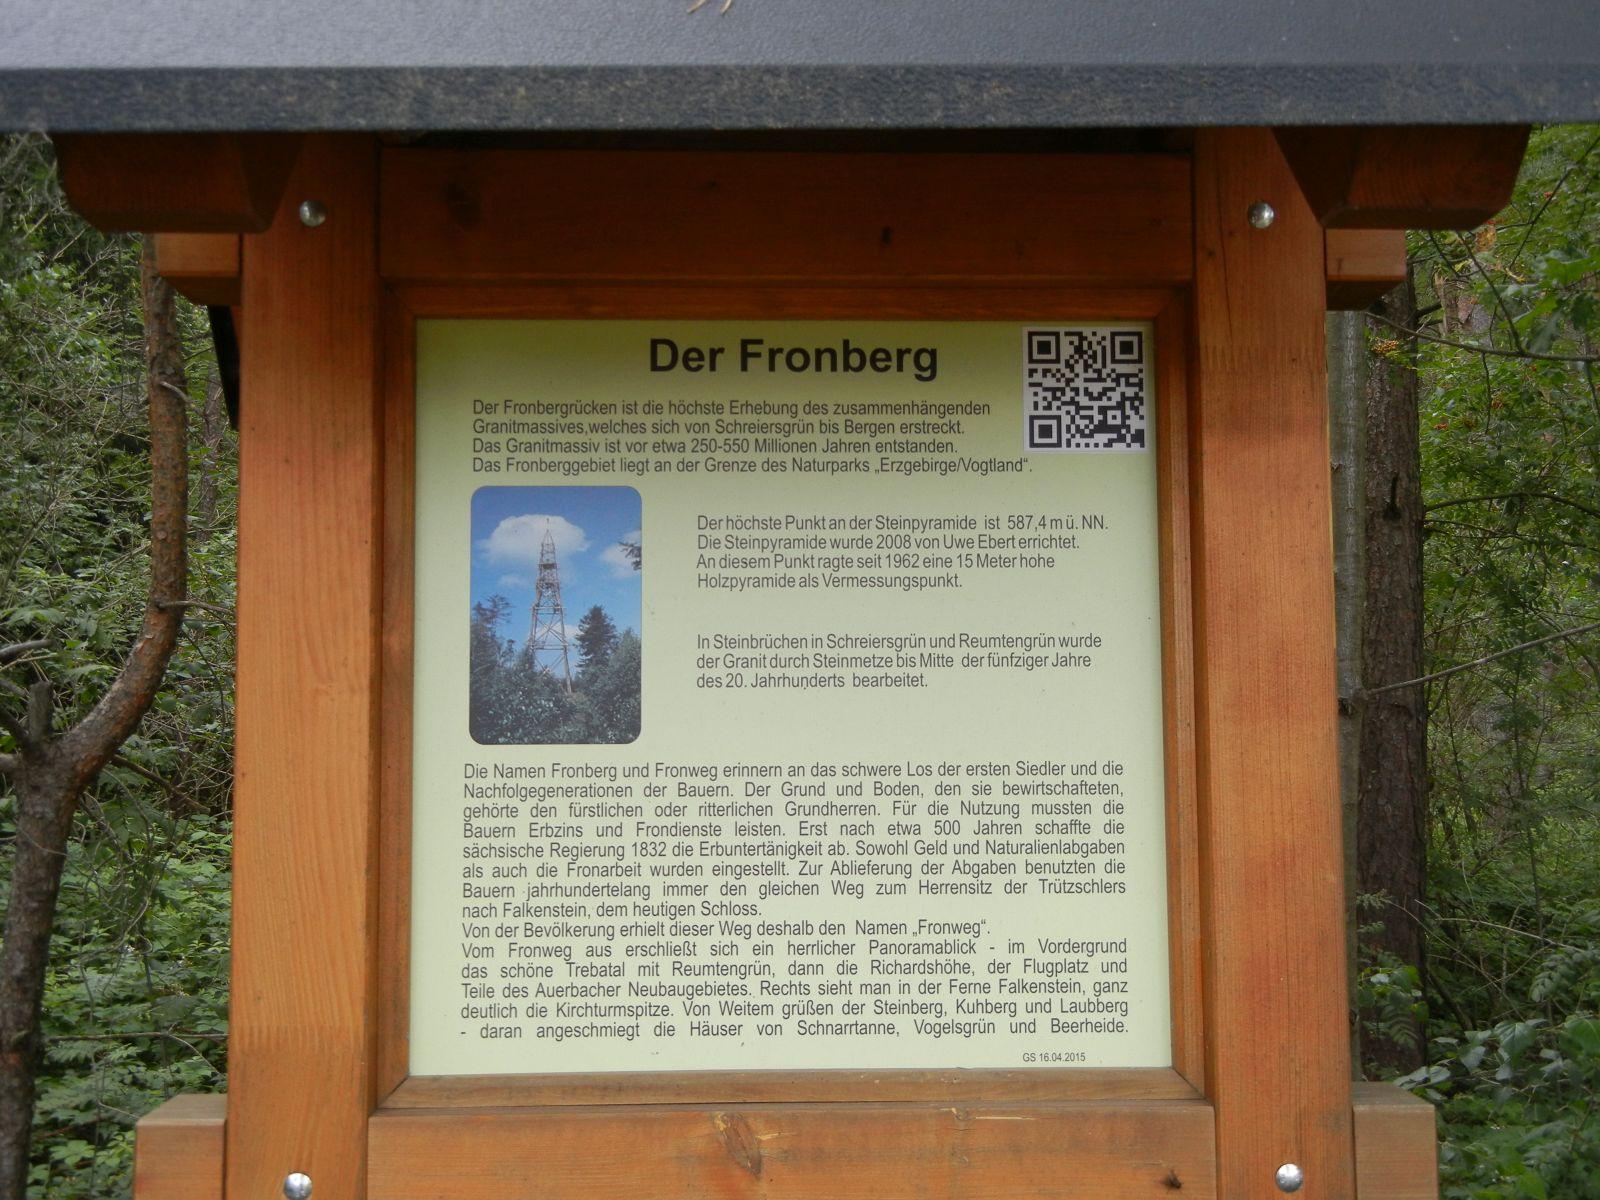 Am Fronberg